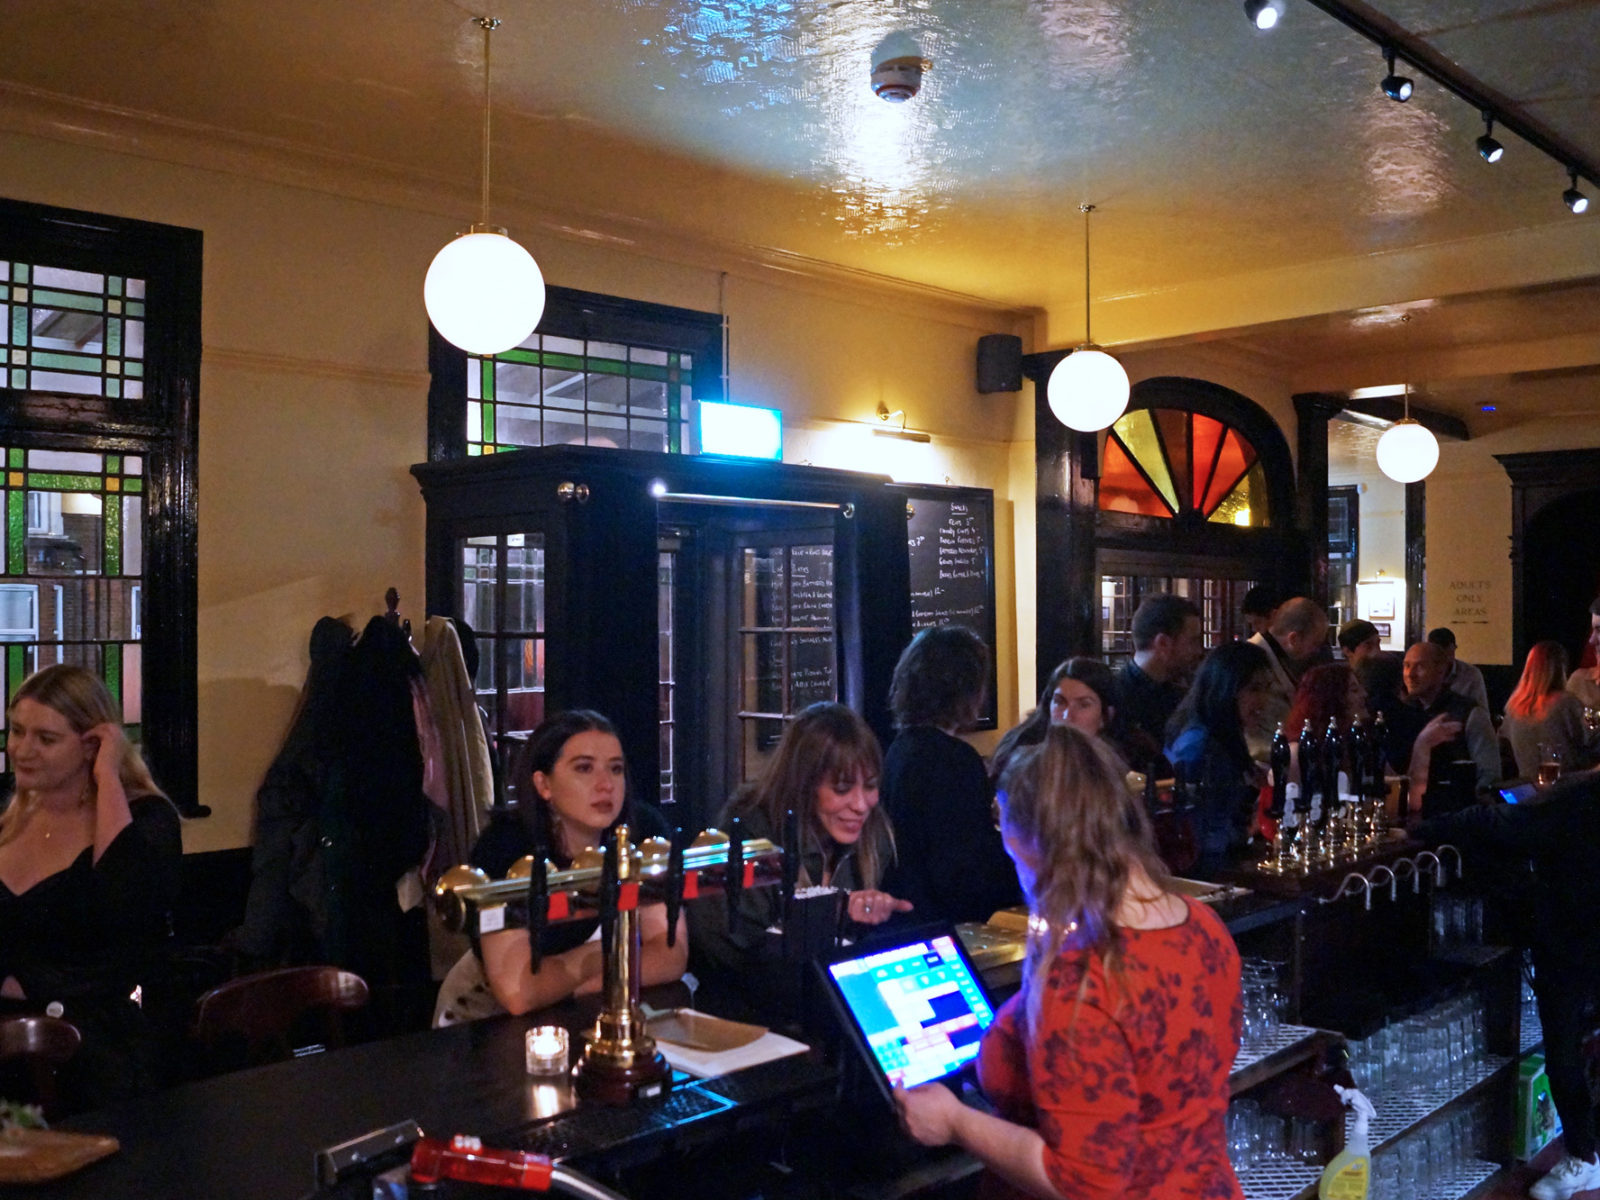 Customers ordering at the bar